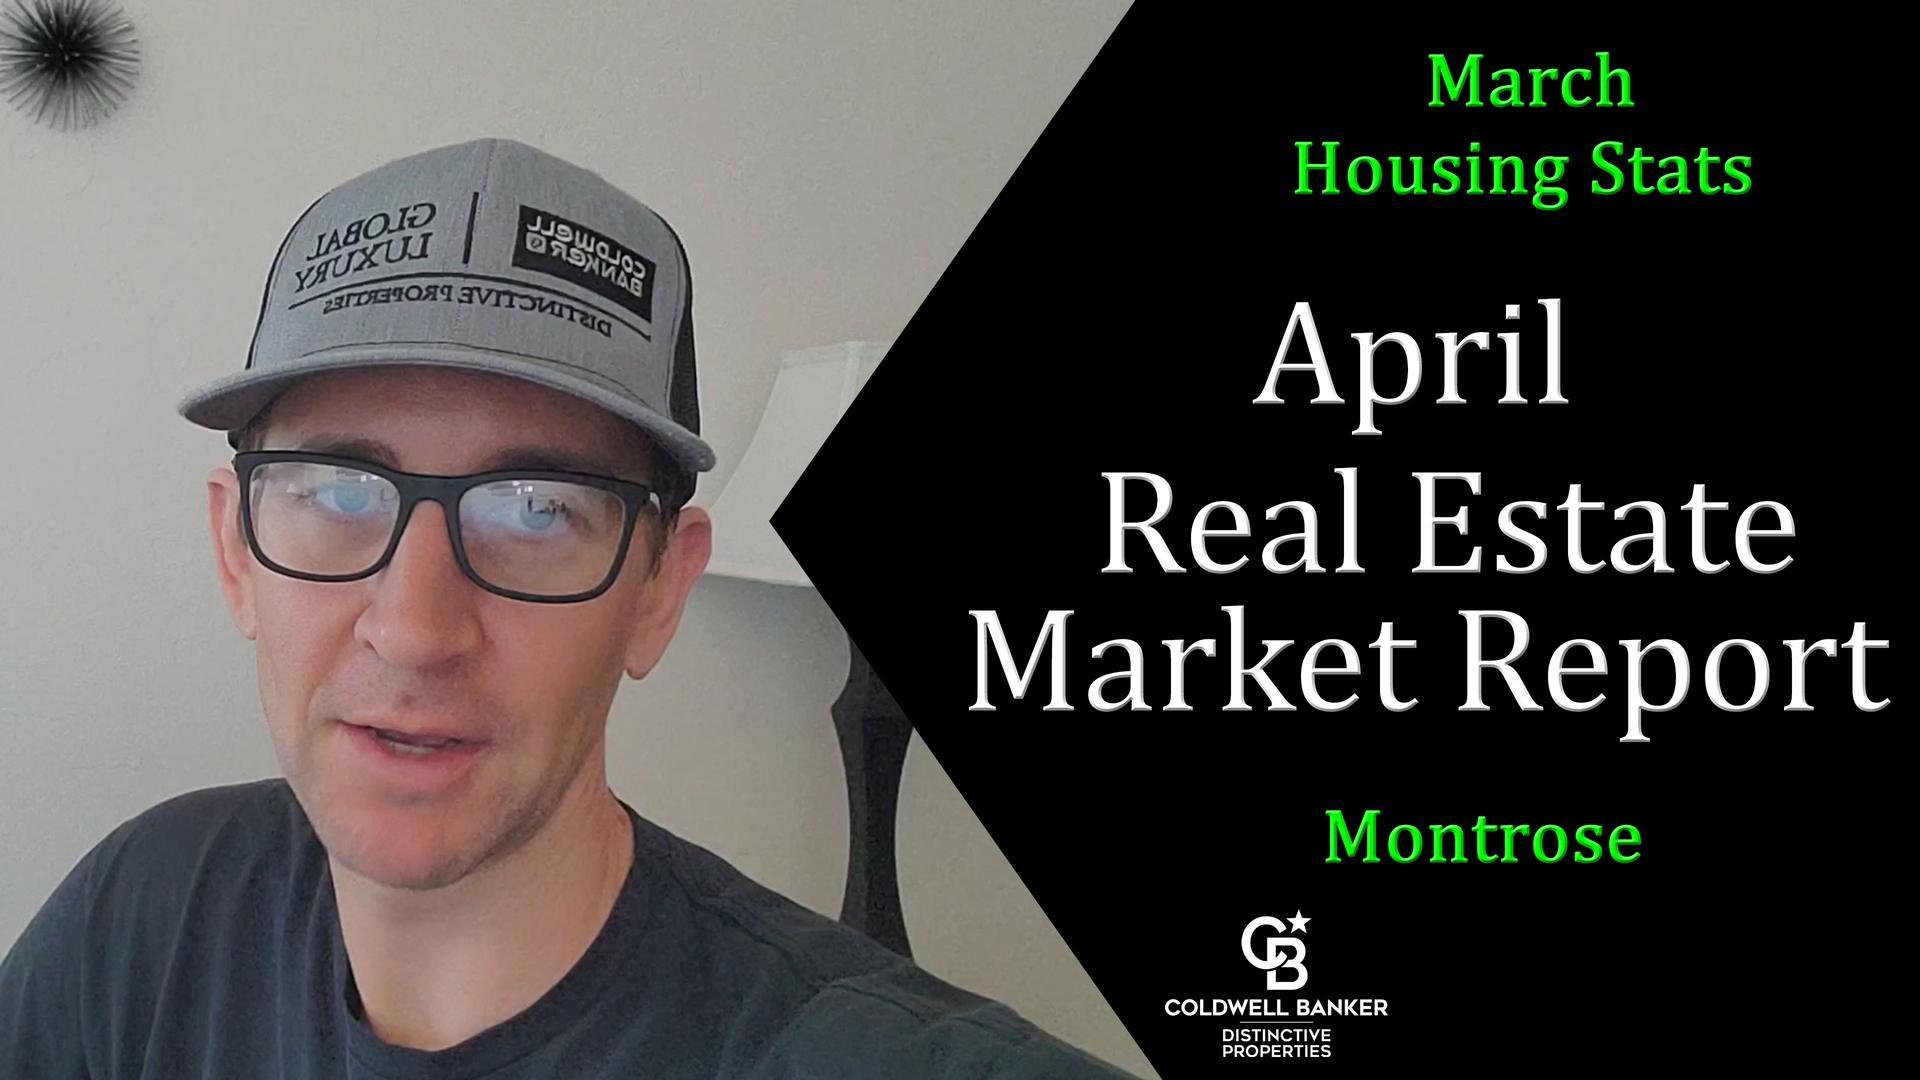 April Real Estate Market Report Montrose Colorado Main Photo